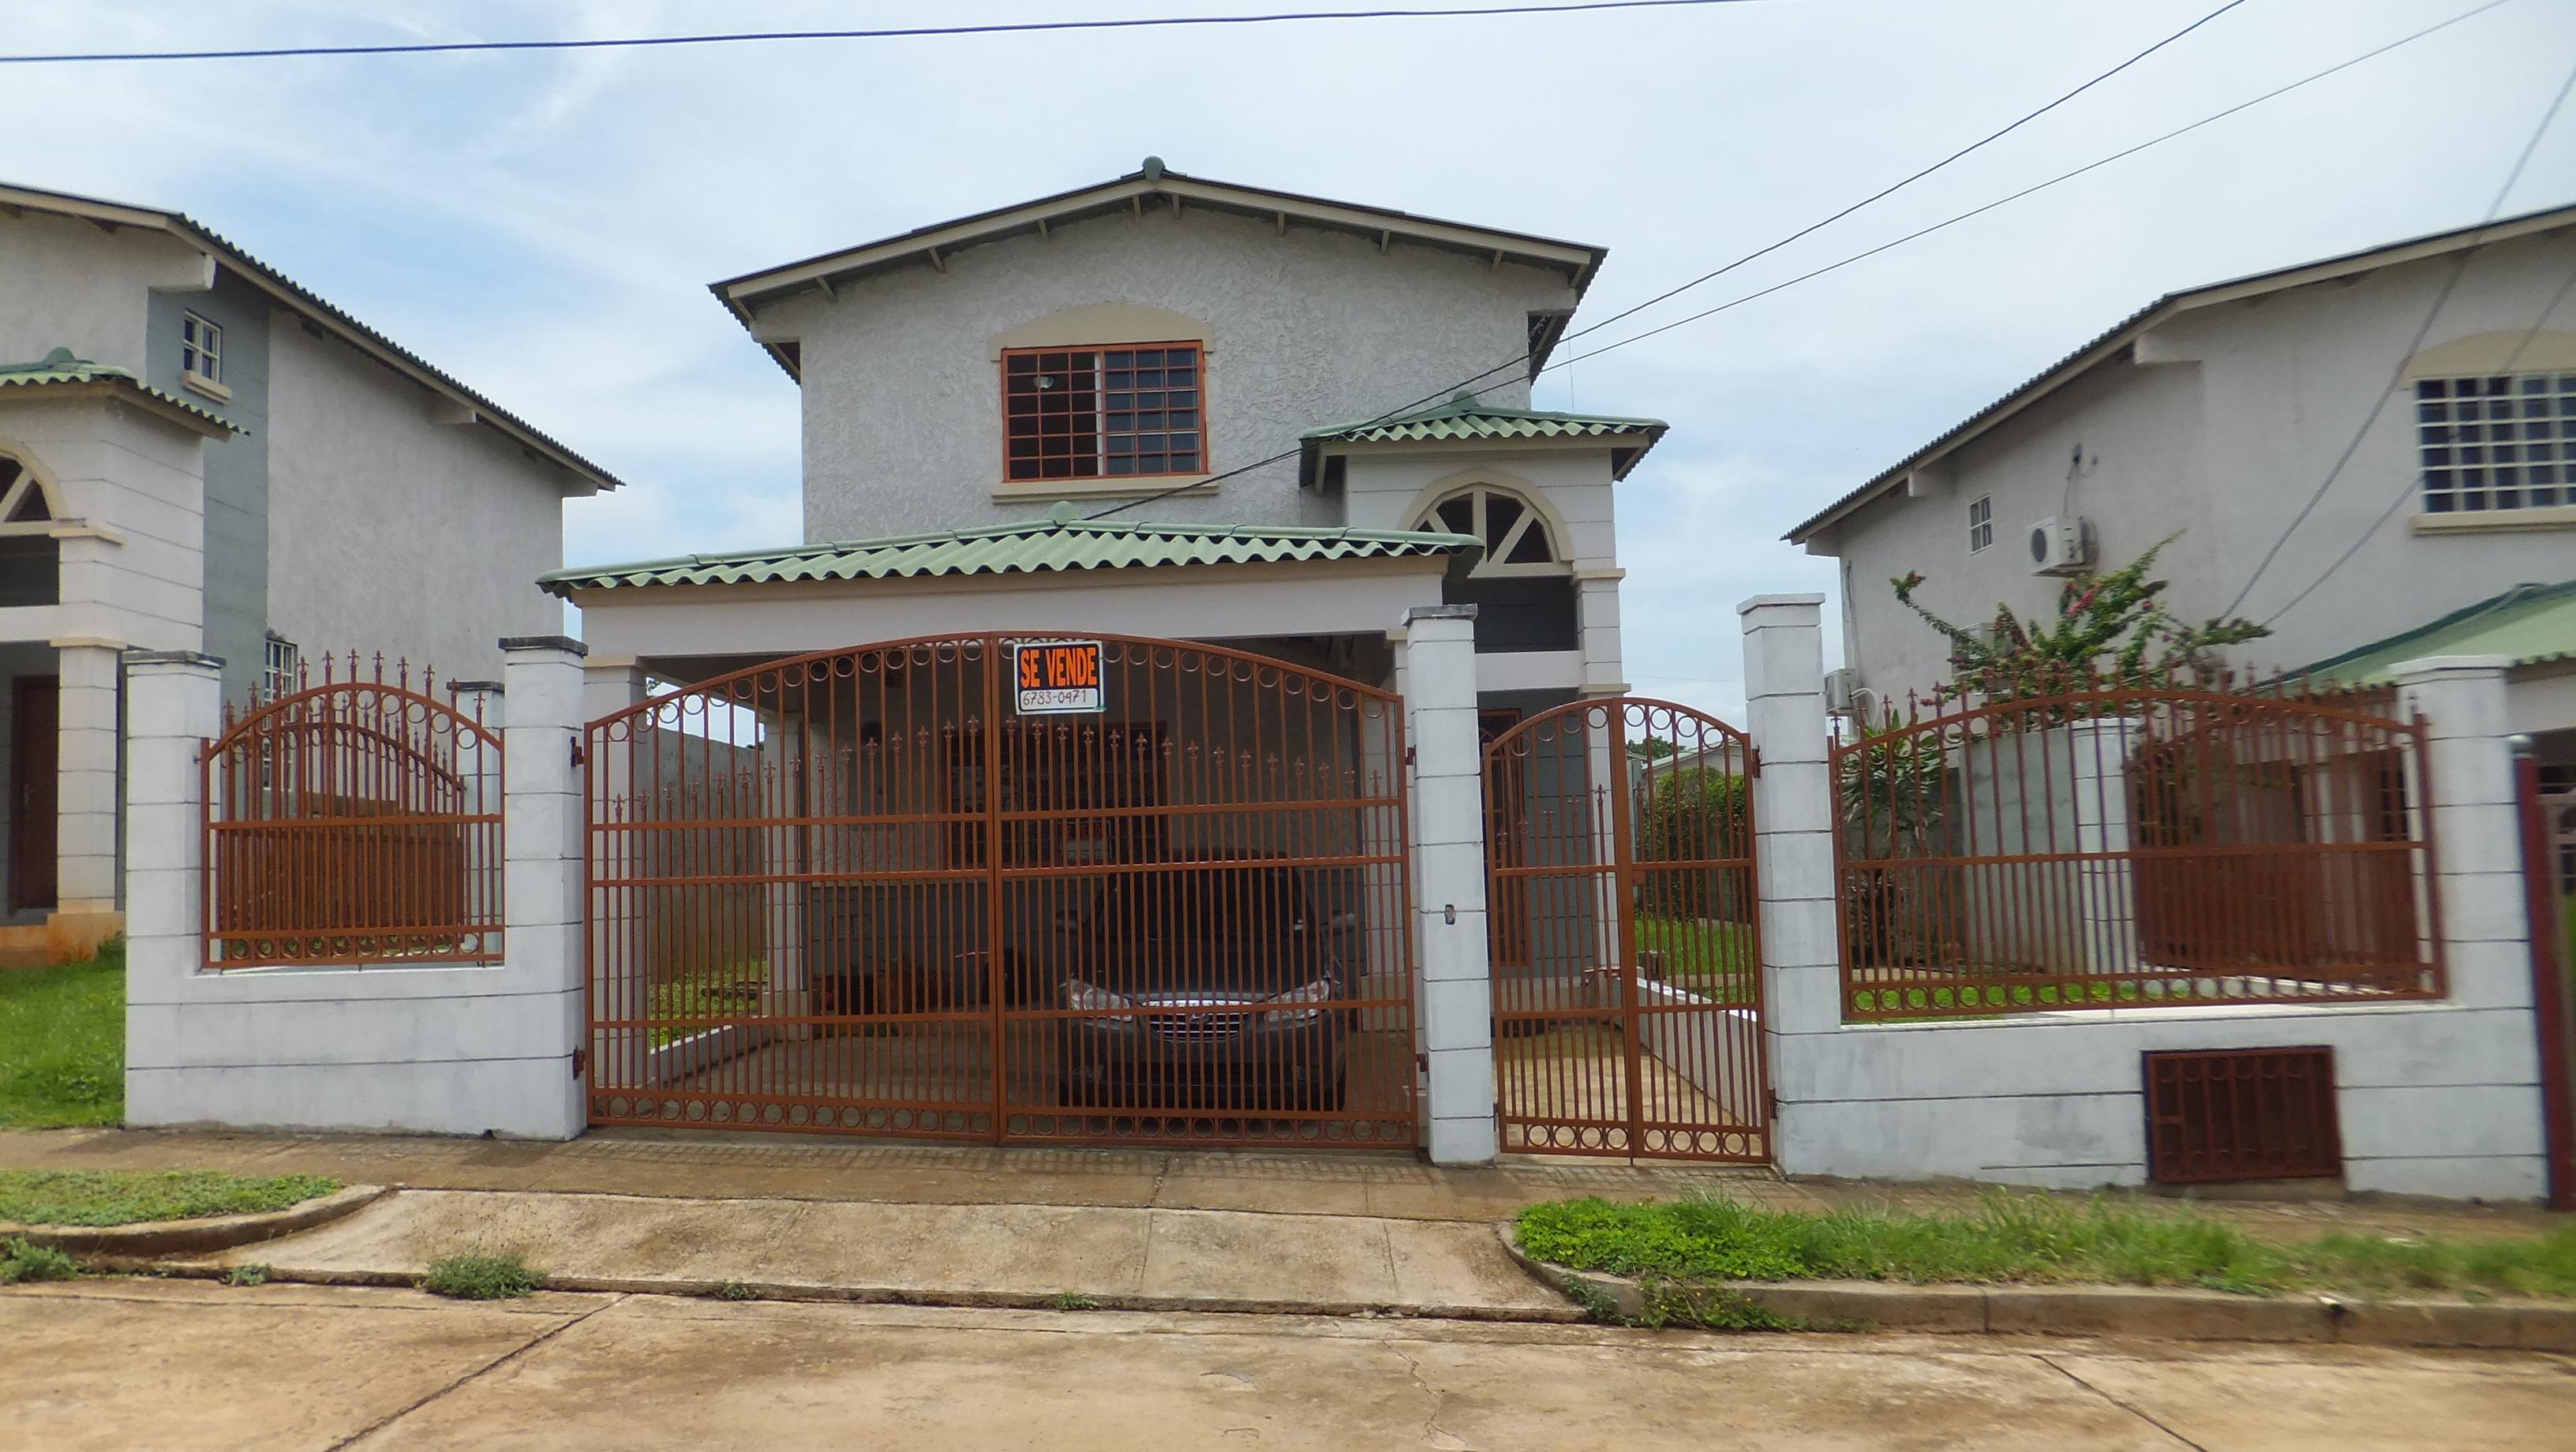 Vendo casa modelo perla en quintas del pac fico con aval o for Modelo de casa quinta en paraguay